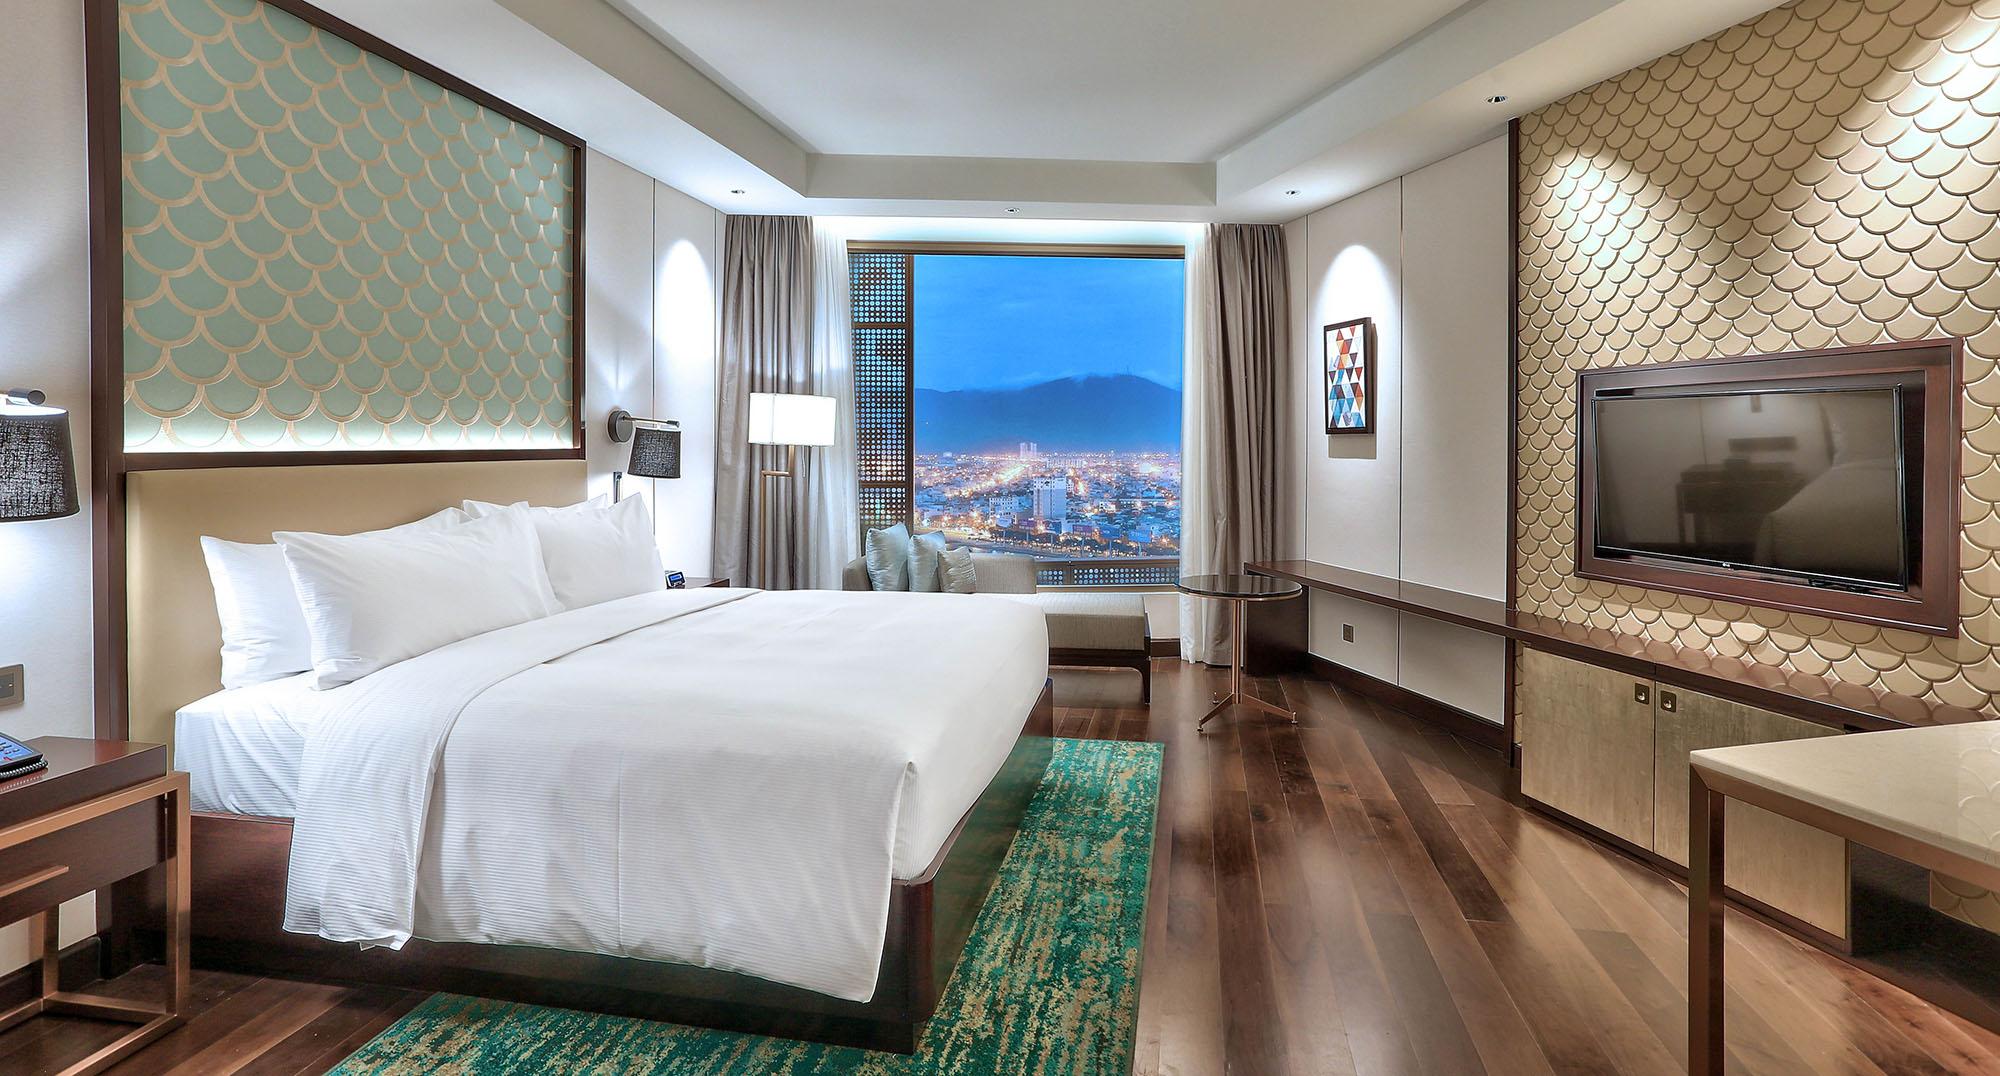 Guest Room Ocean View King Bed Hilton Da Nang Trai Nghiem Khach San Day Phong Cach Giua Long Thanh Pho Danang Fantasticity 01